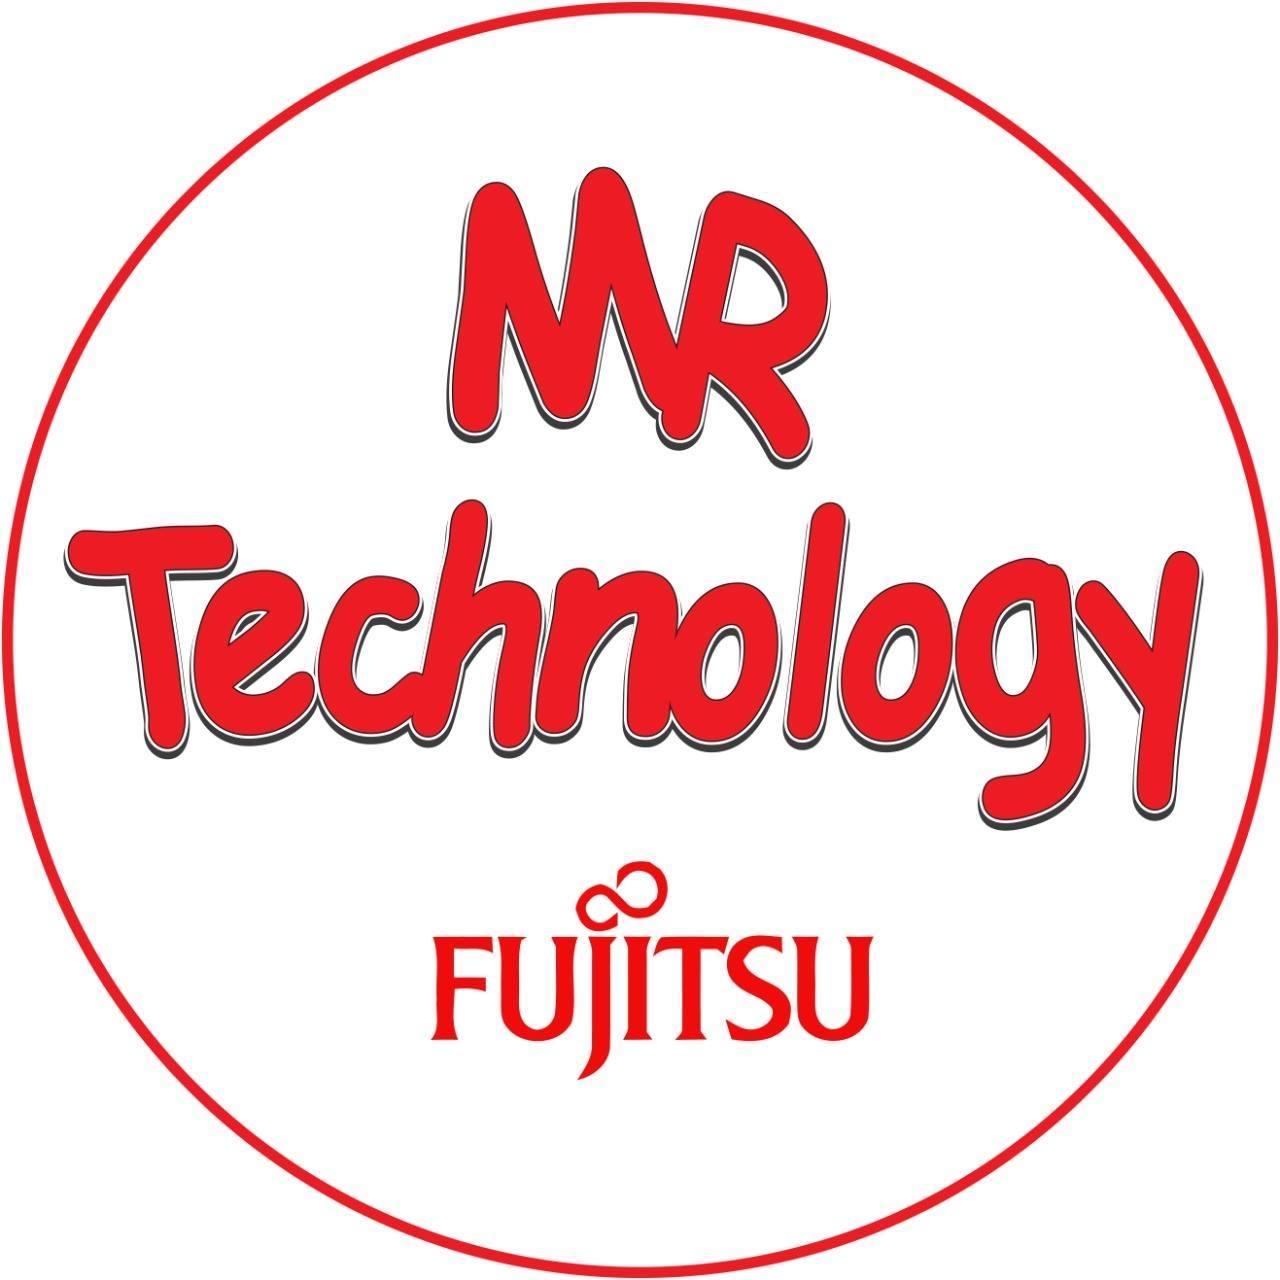 إم أر تكنولوجي MR technology